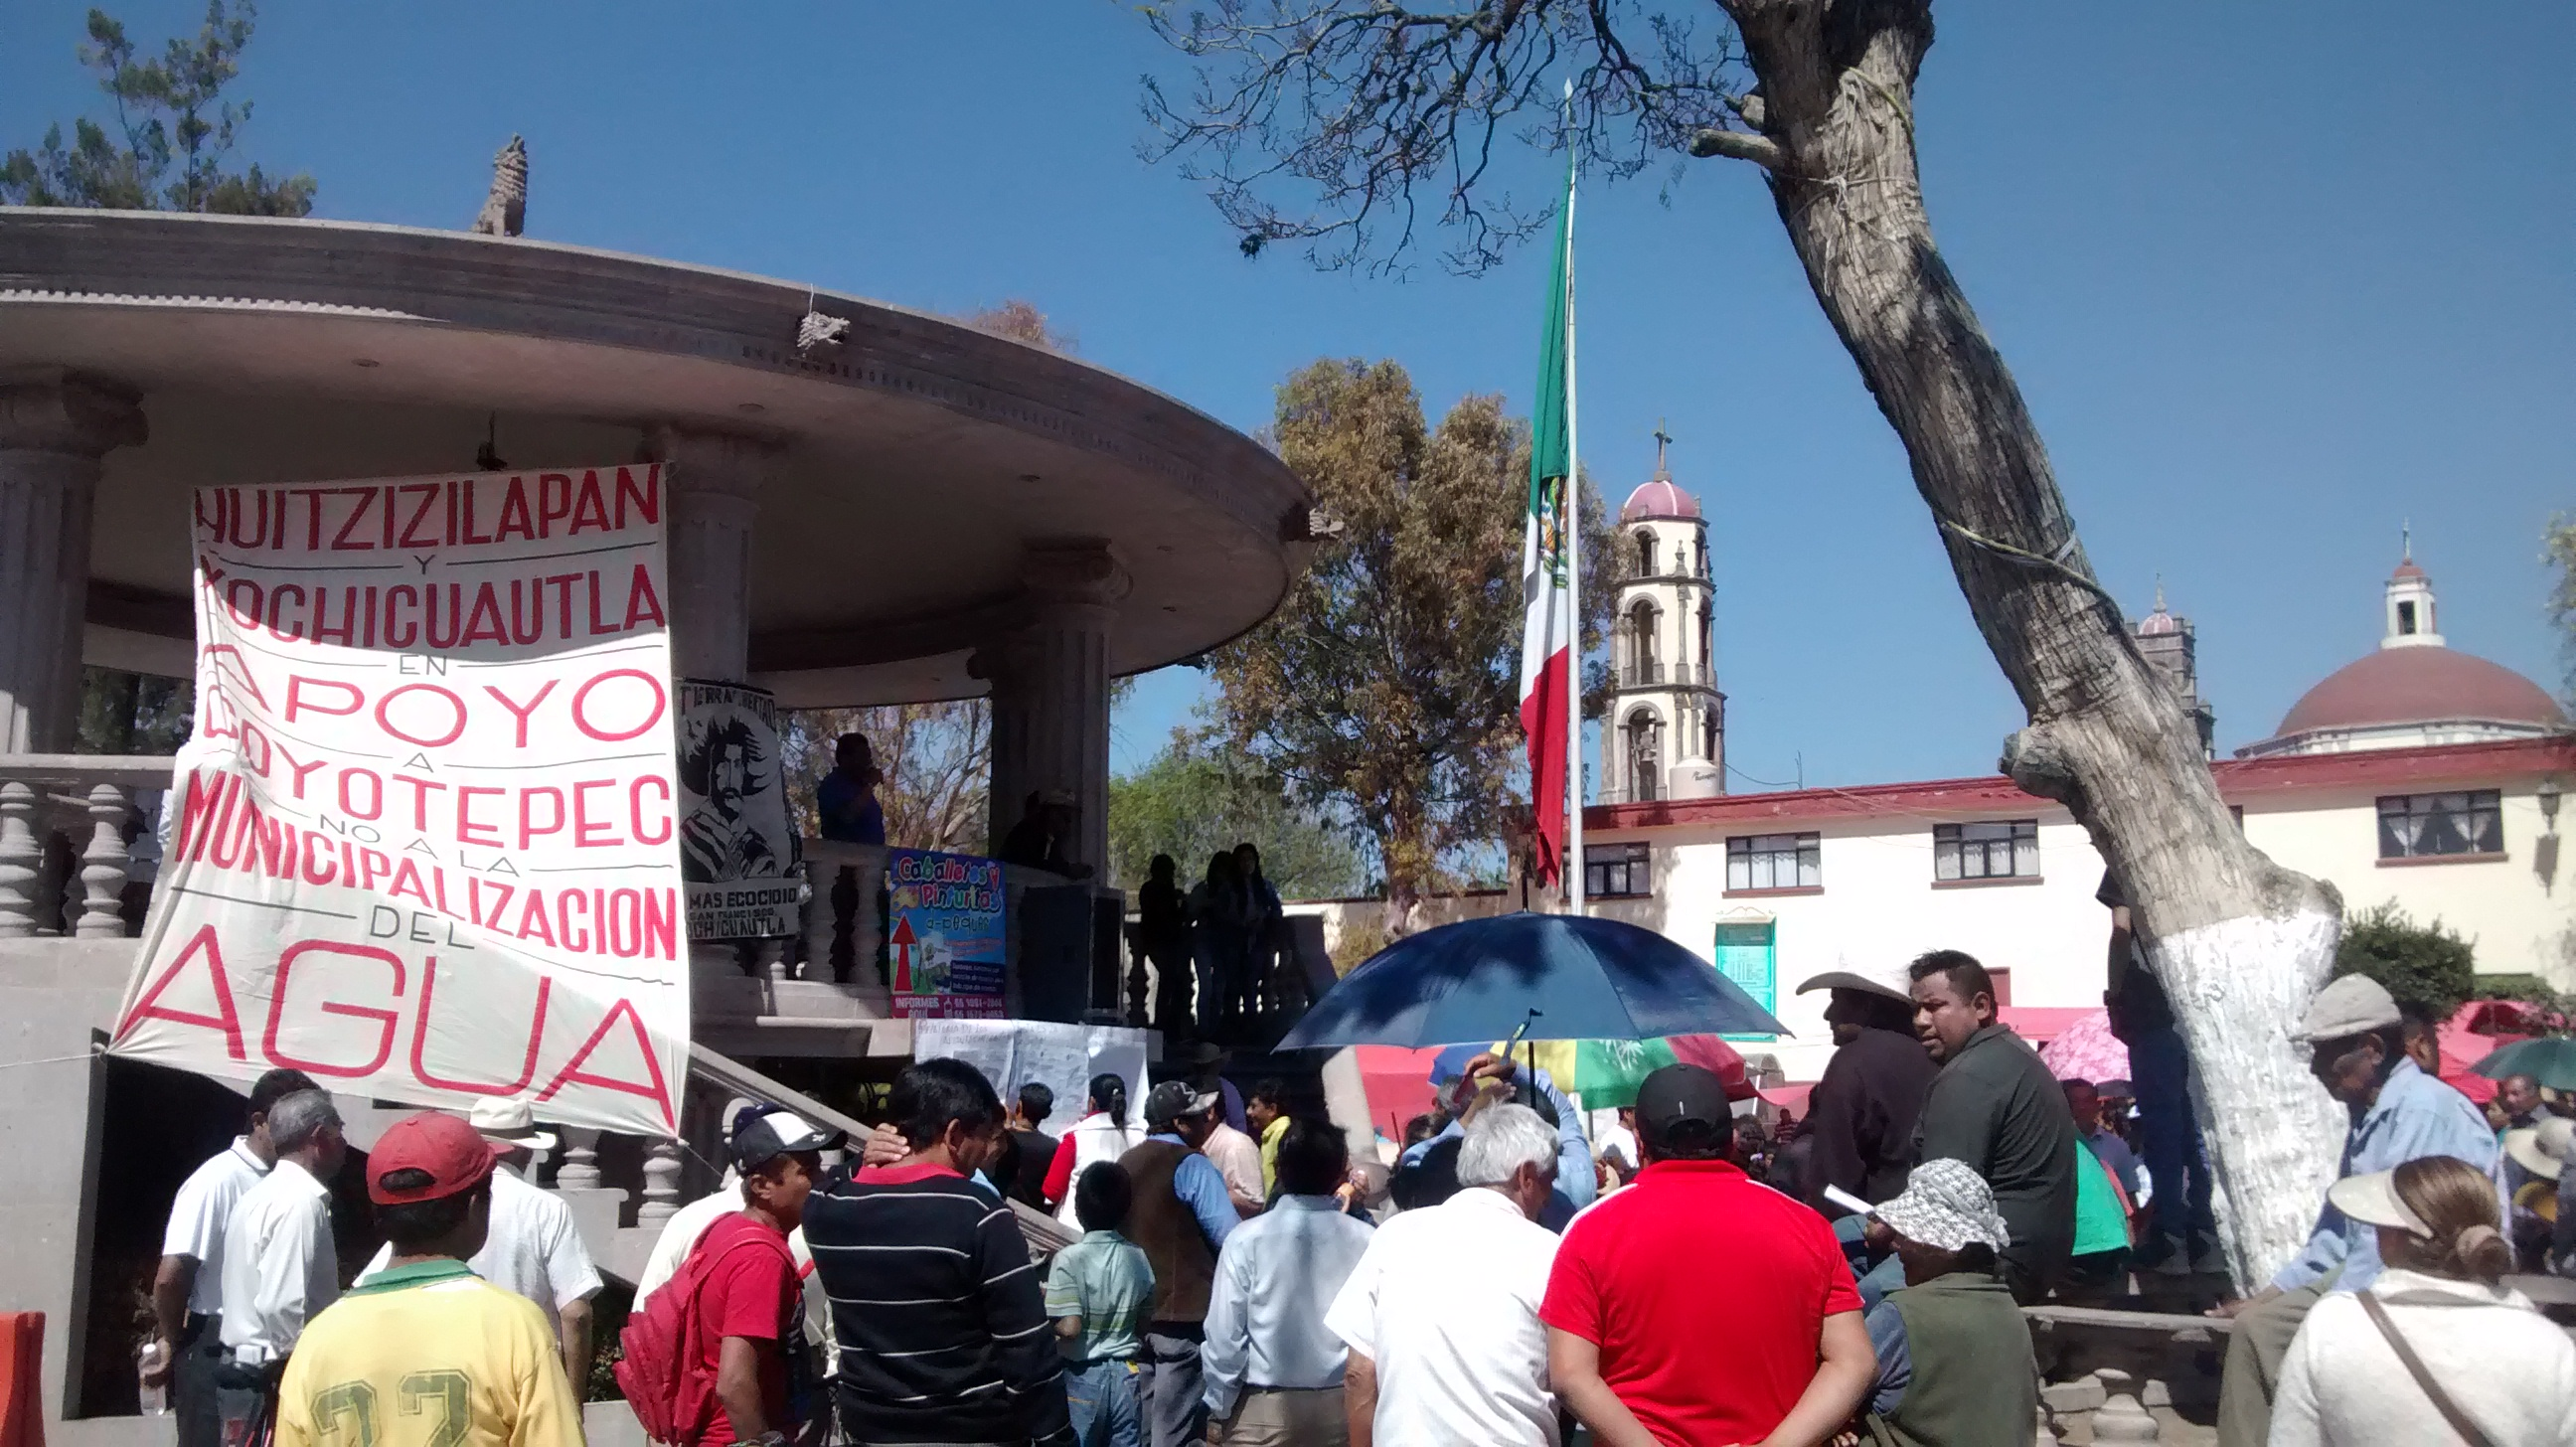 Habitantes de Coyotepec denuncian intento de privatización de agua